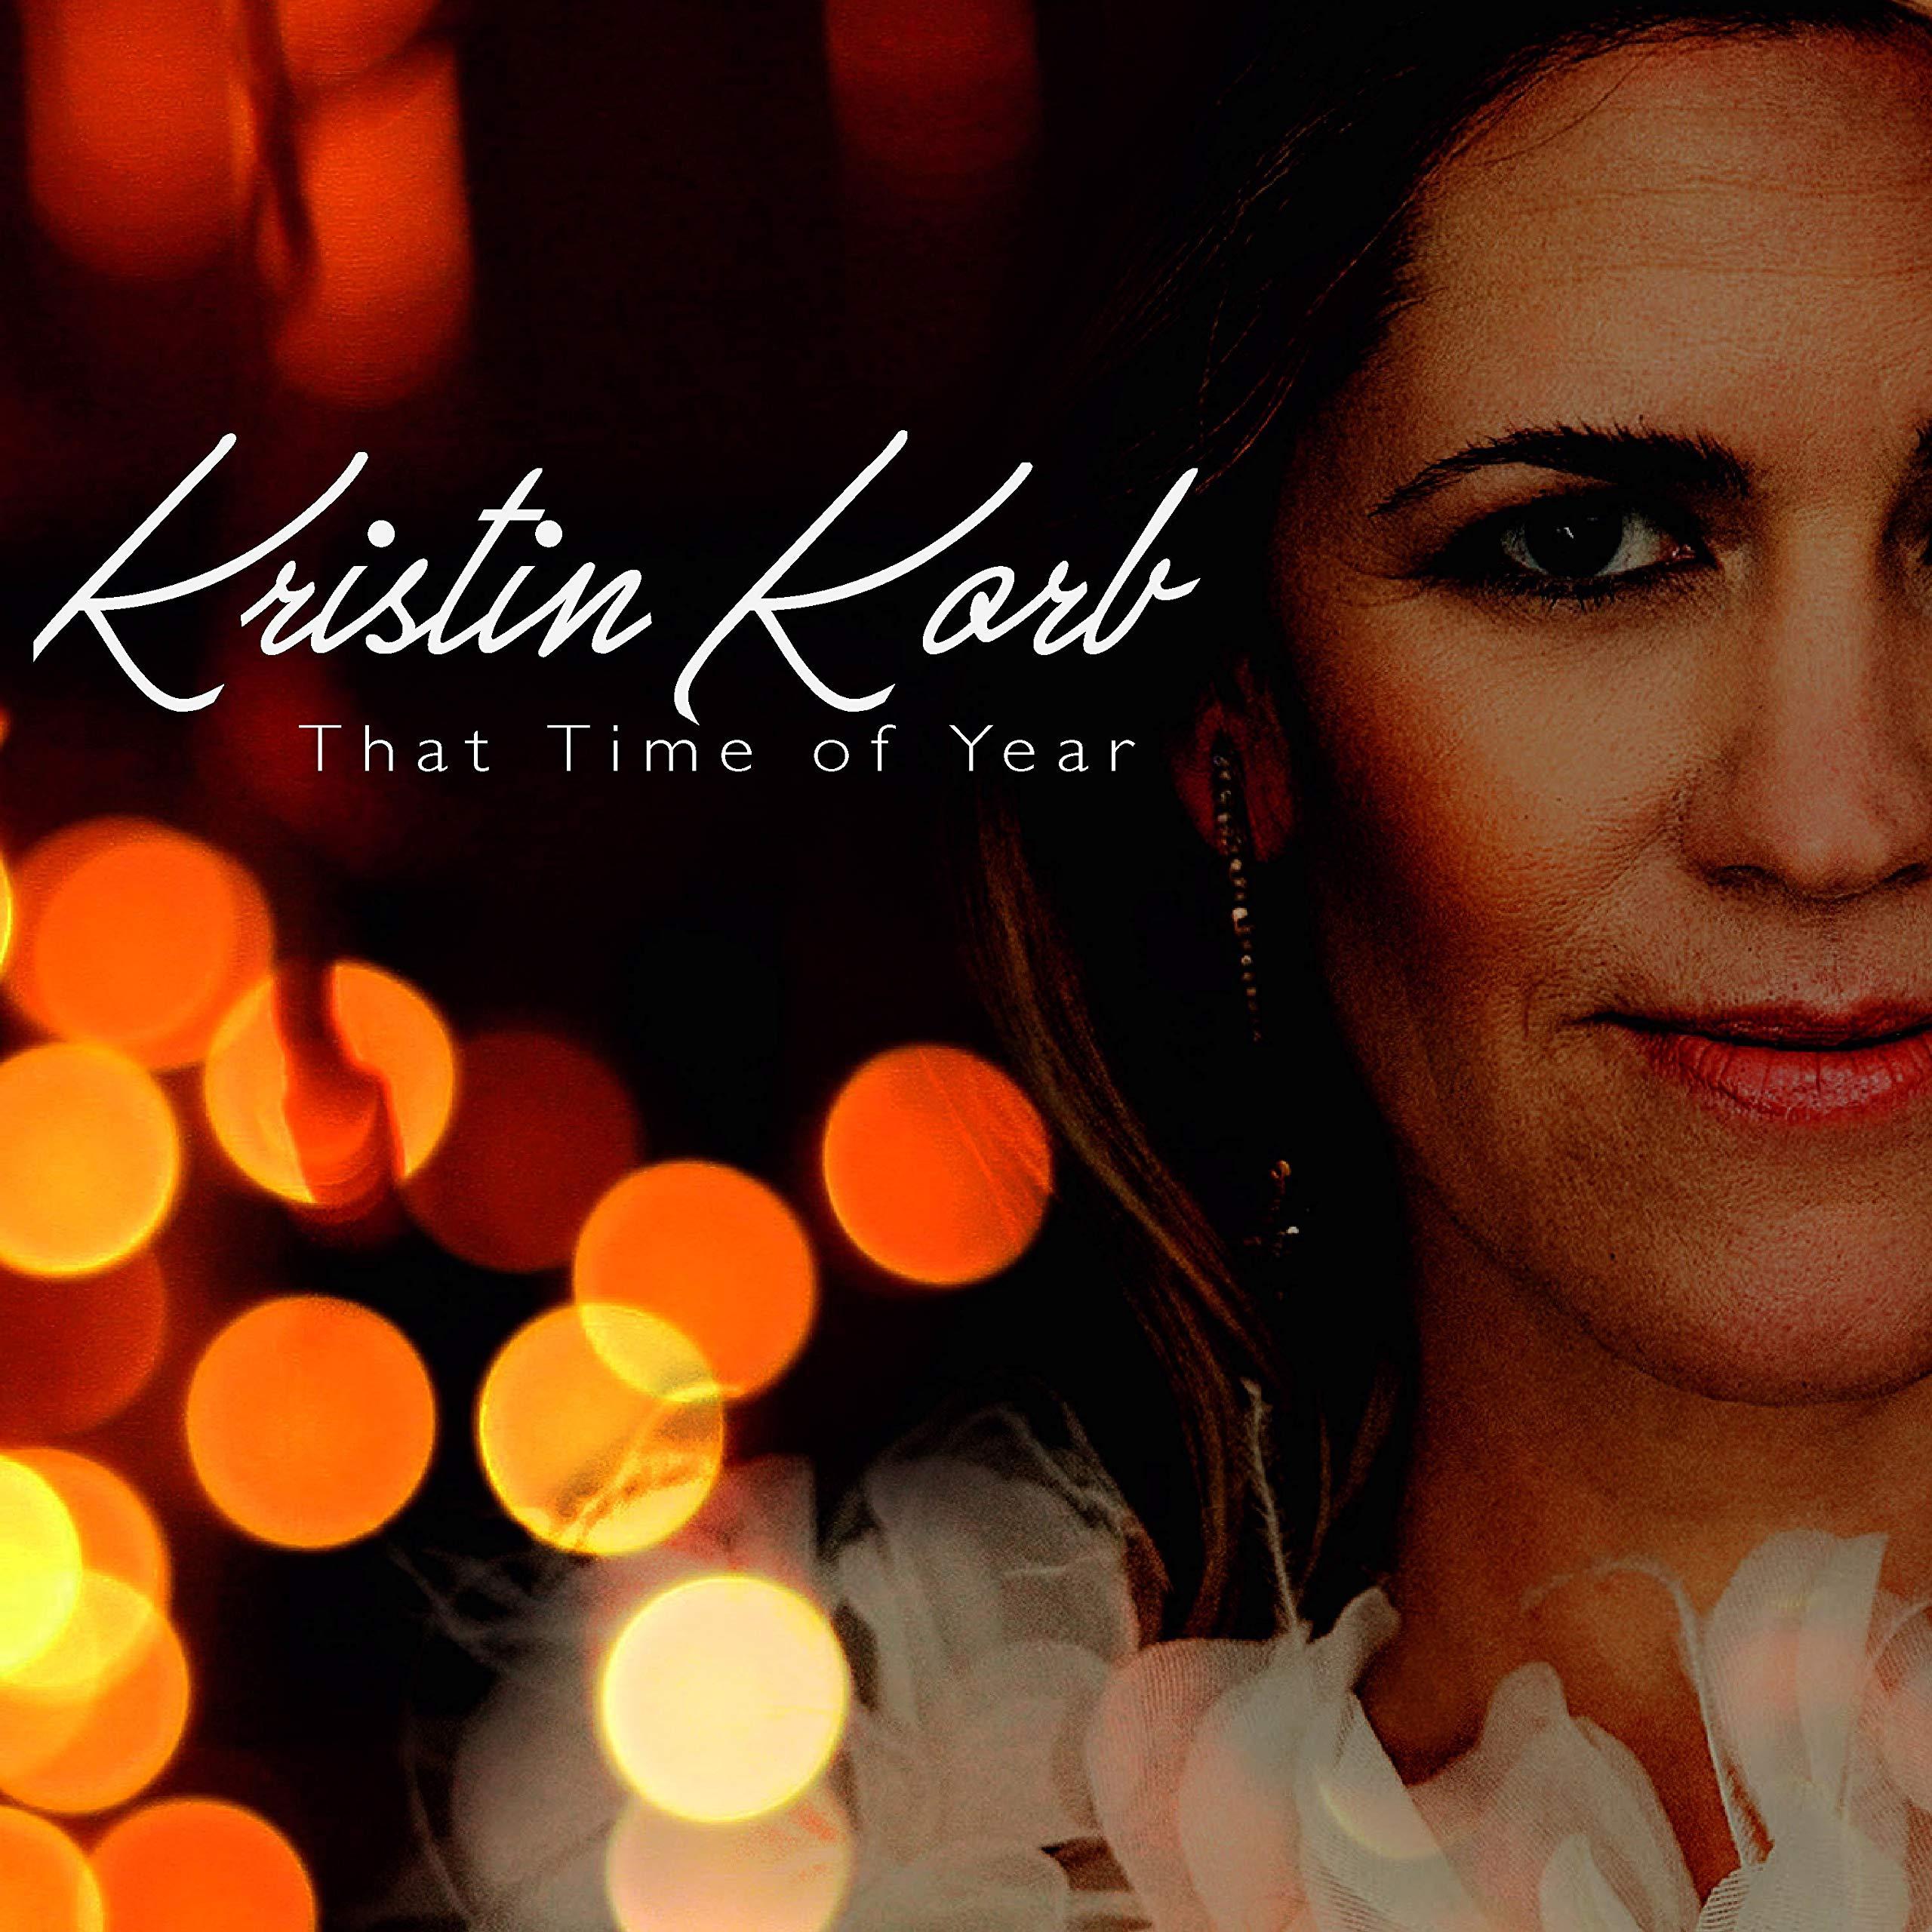 CD : KRISTIN KORB - That Time Of Year (CD)